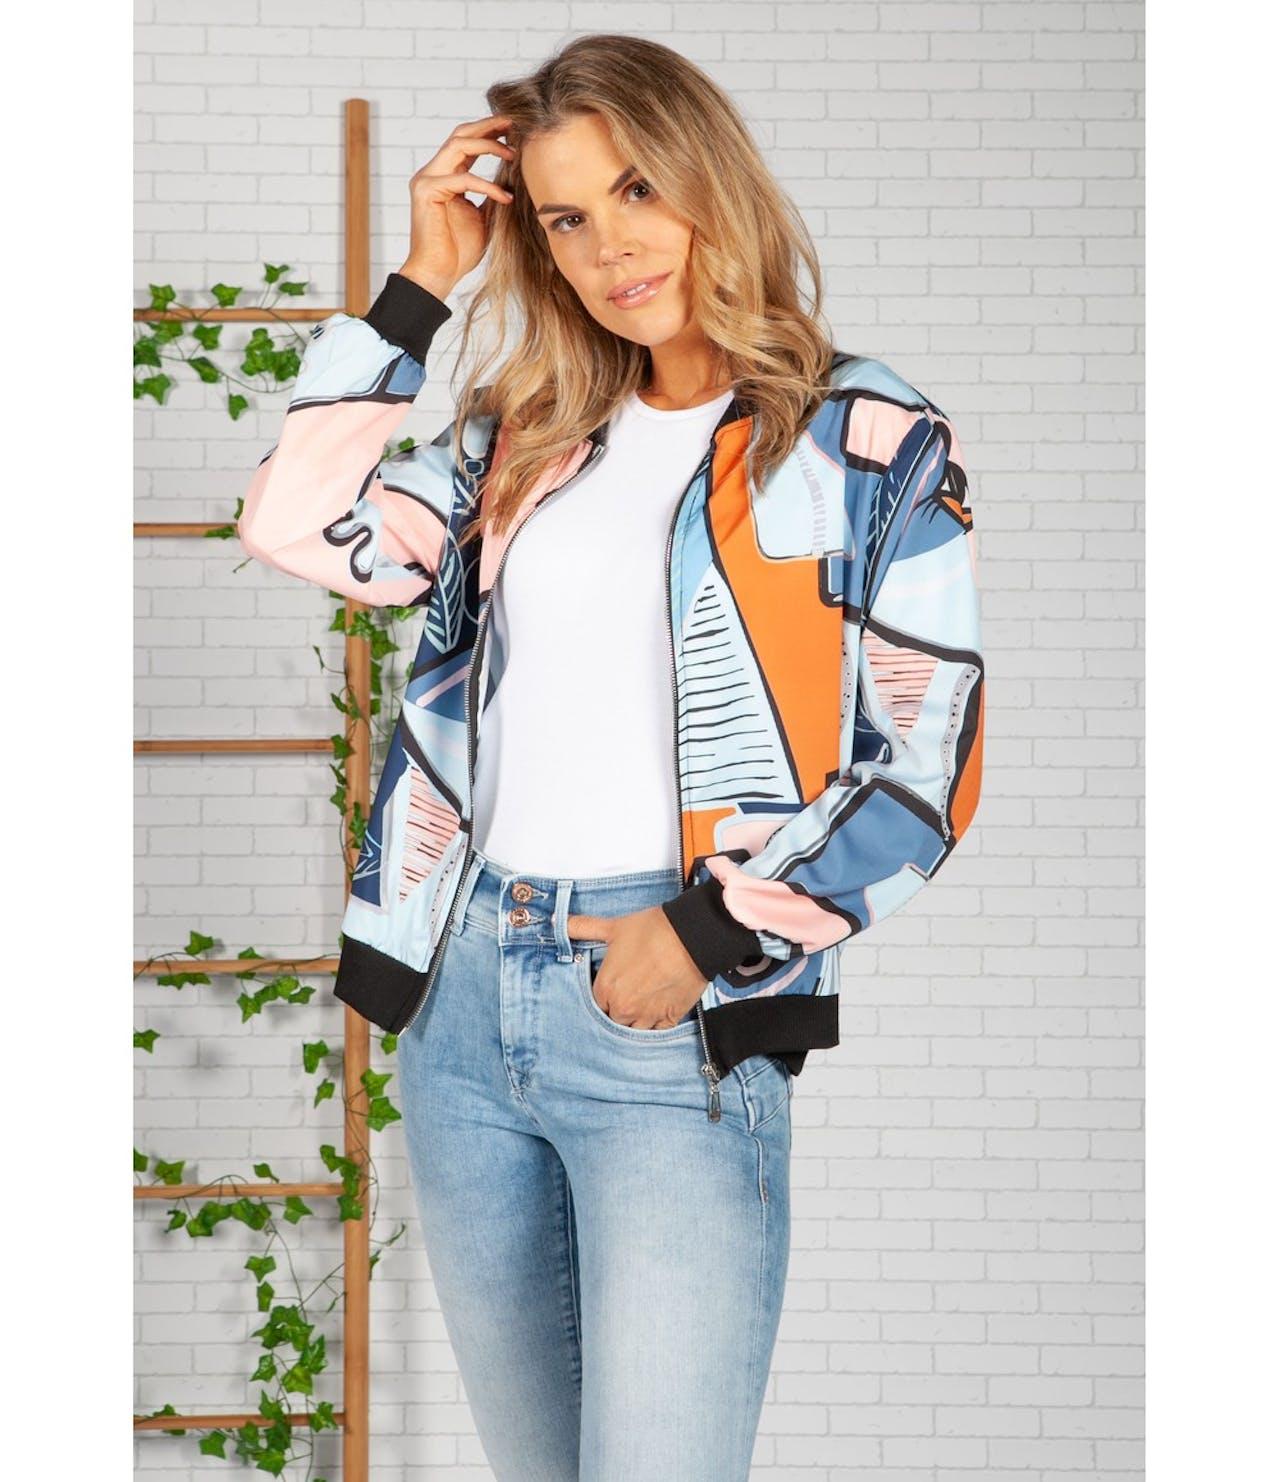 Zapara Blue Picasso Bomber Jacket